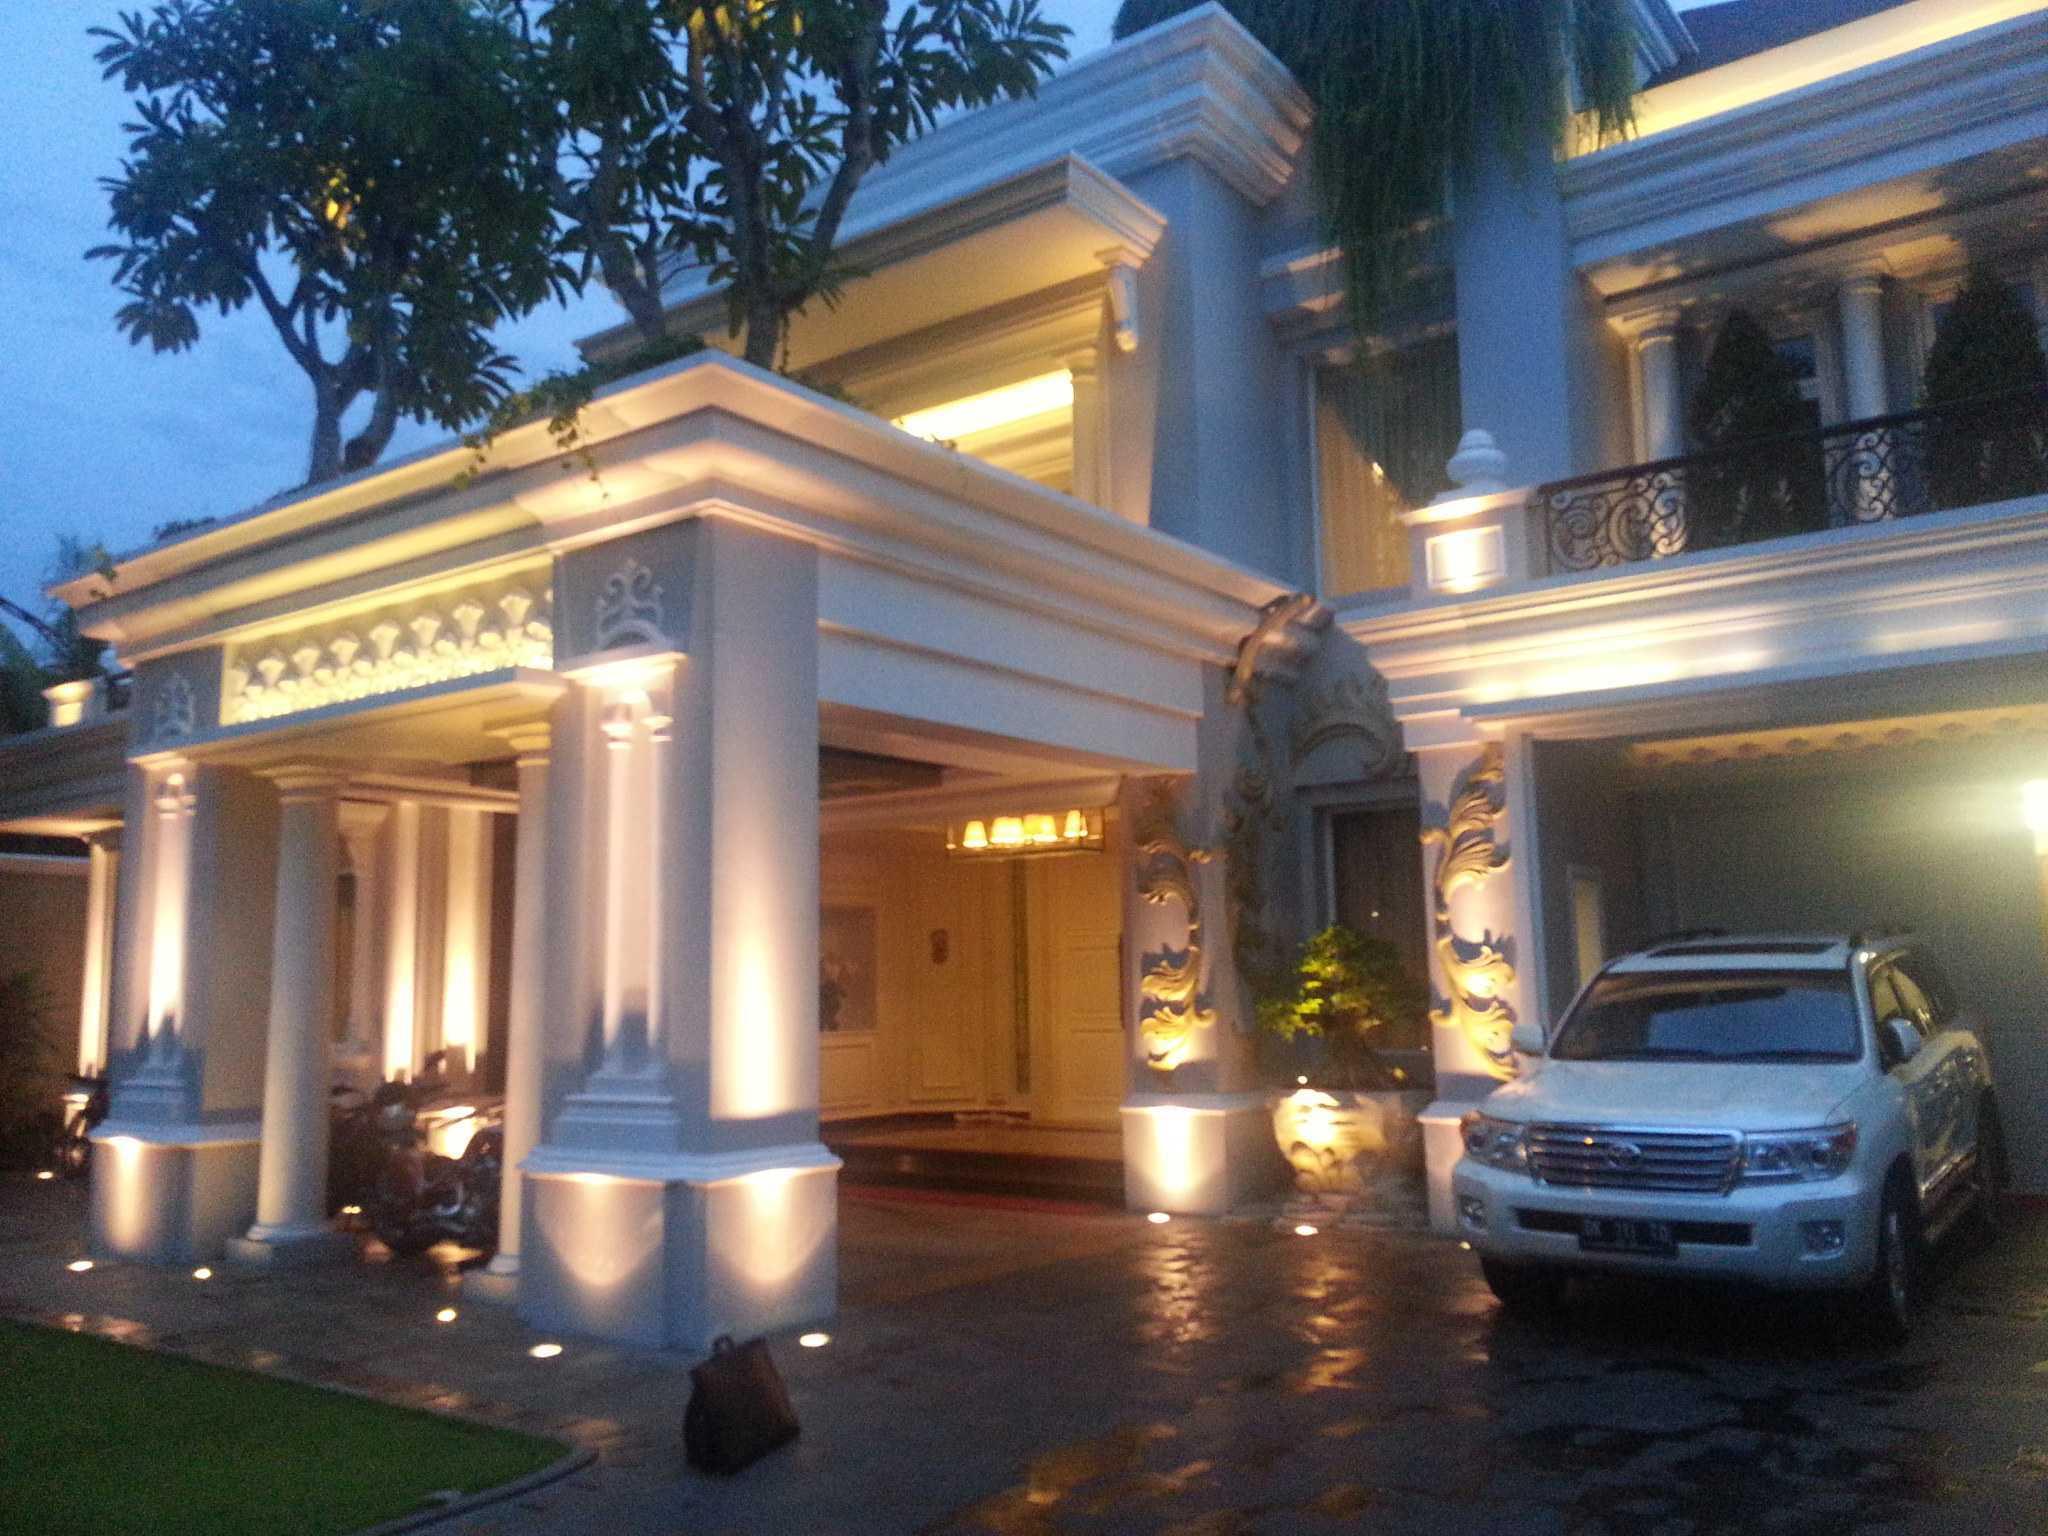 A N J A R S I T E K Classical House - Renon / Denpasar - Bali Renon, South Denpasar, Denpasar City, Bali, Indonesia Renon, South Denpasar, Denpasar City, Bali, Indonesia Part Of Facade Klasik <P>Part Of Facade</p> 35294